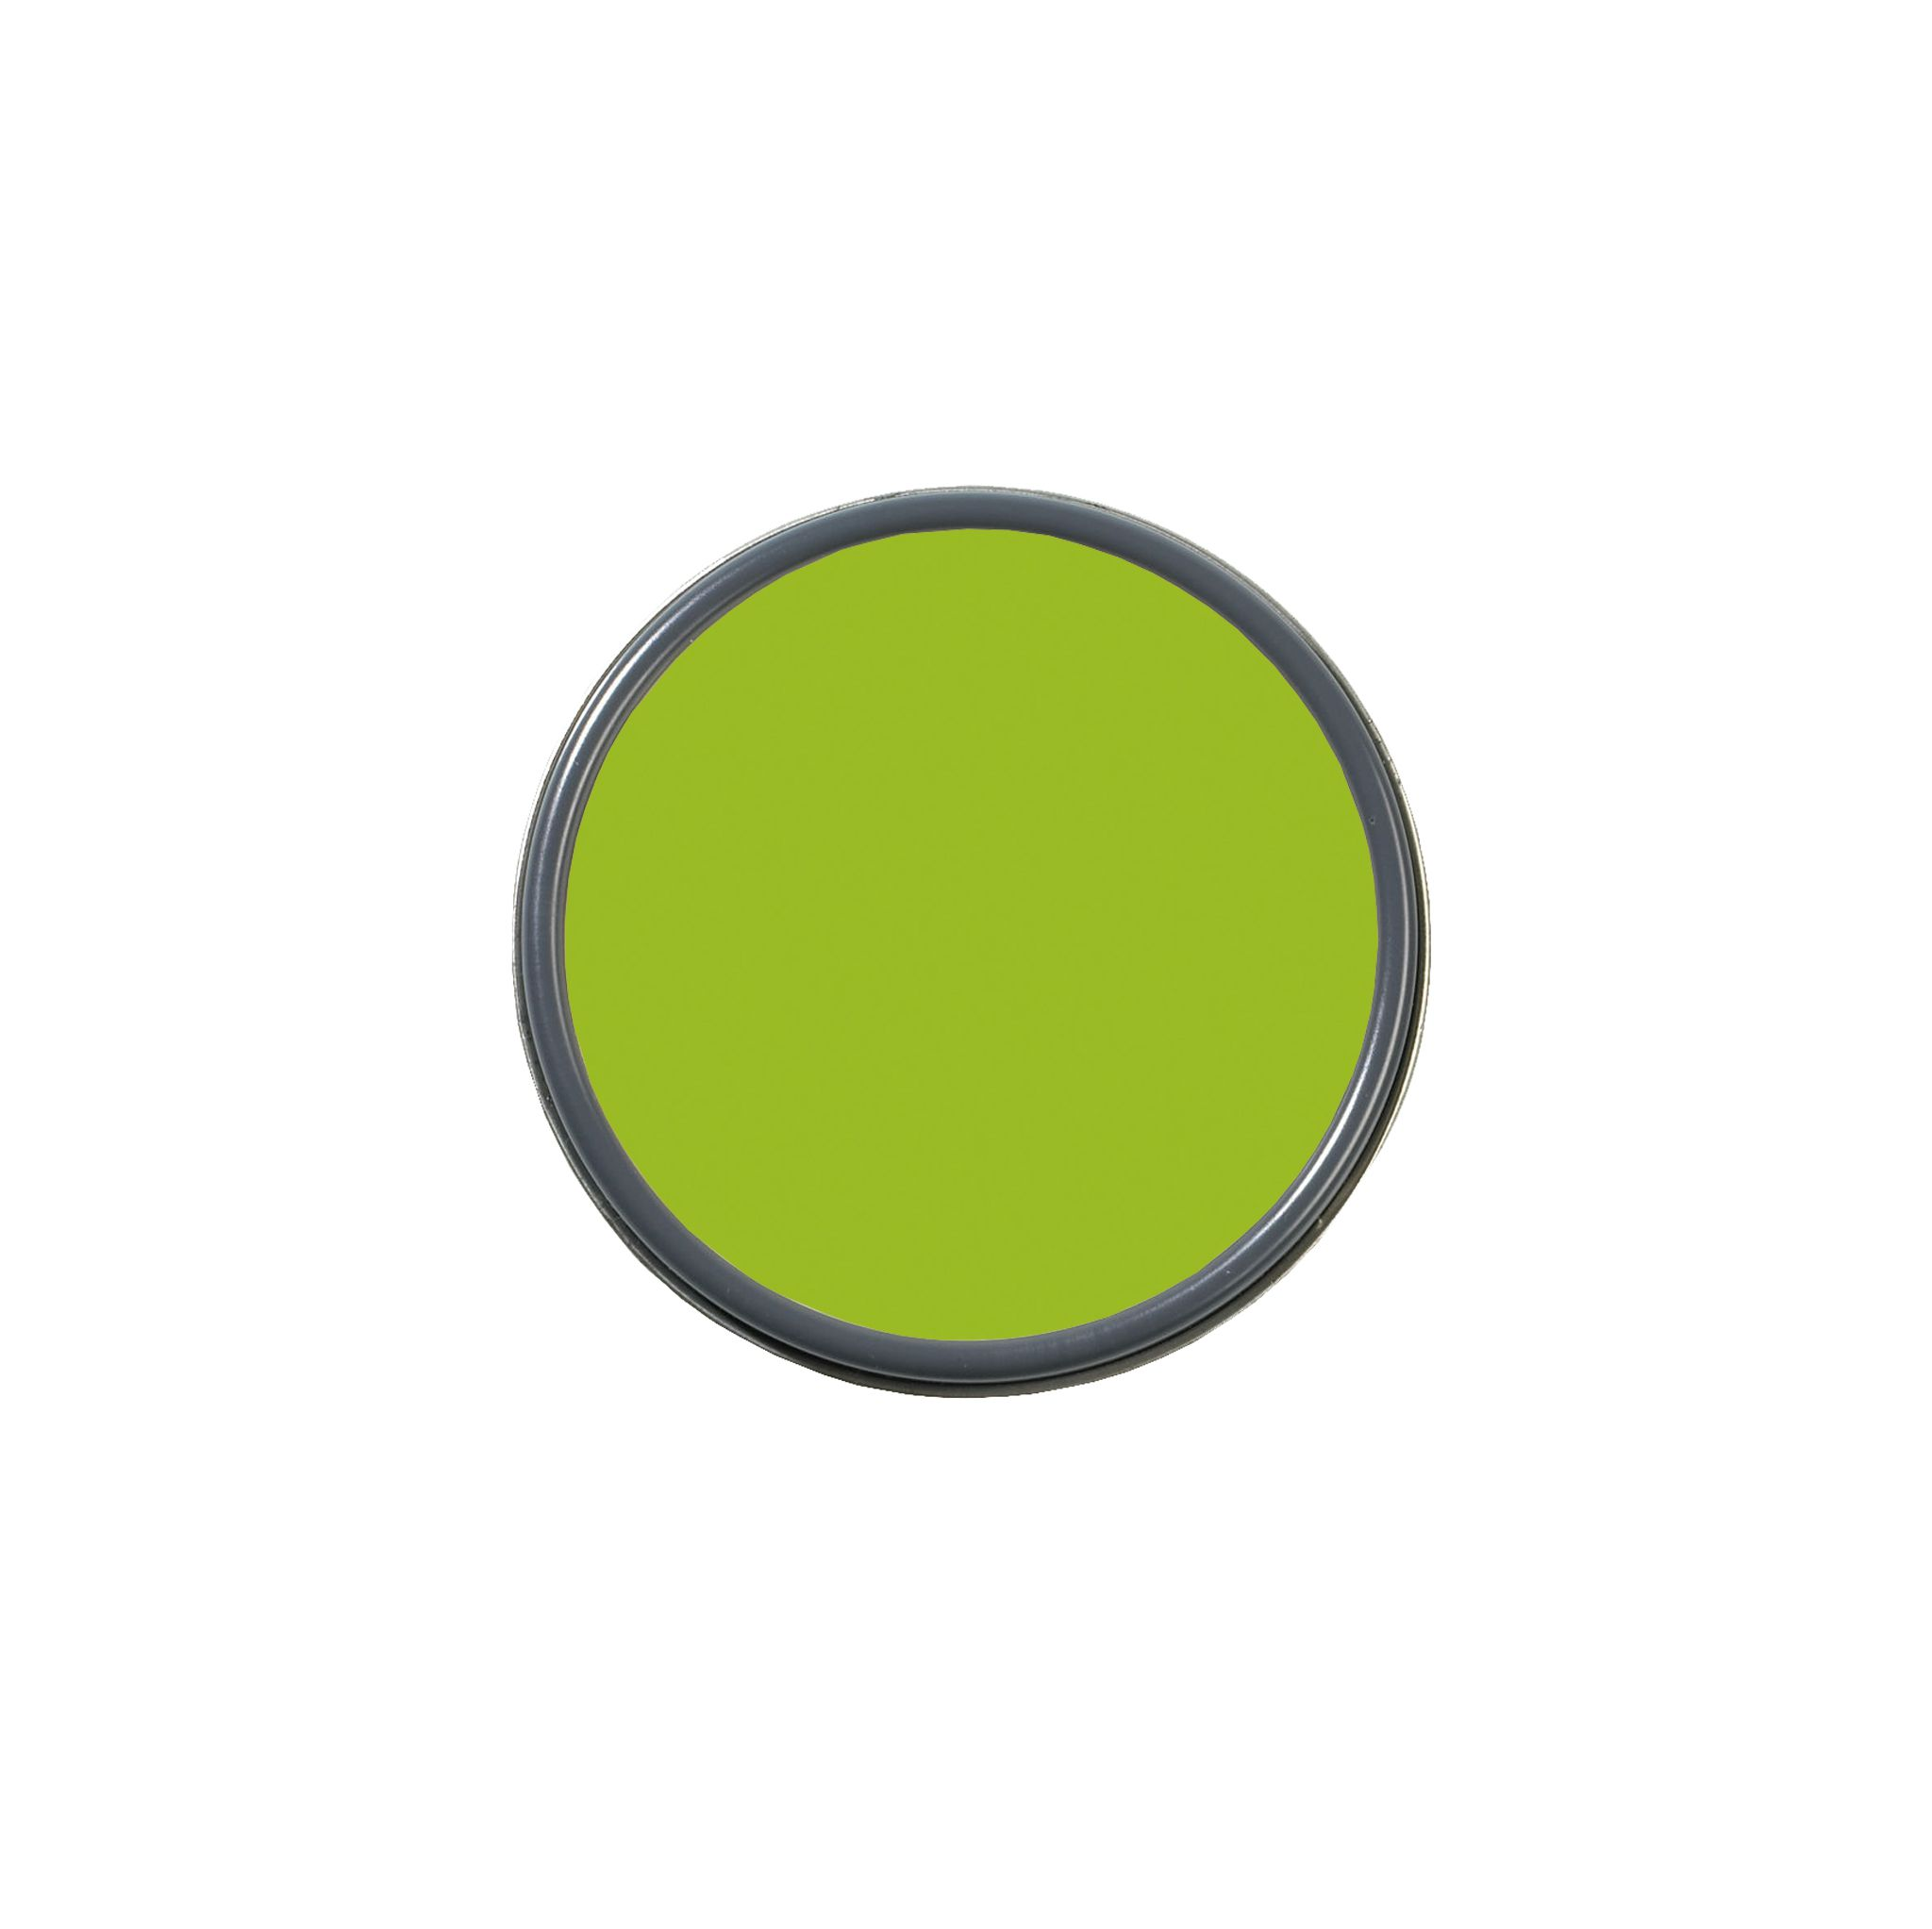 Sherwin Williams - Electric Lime